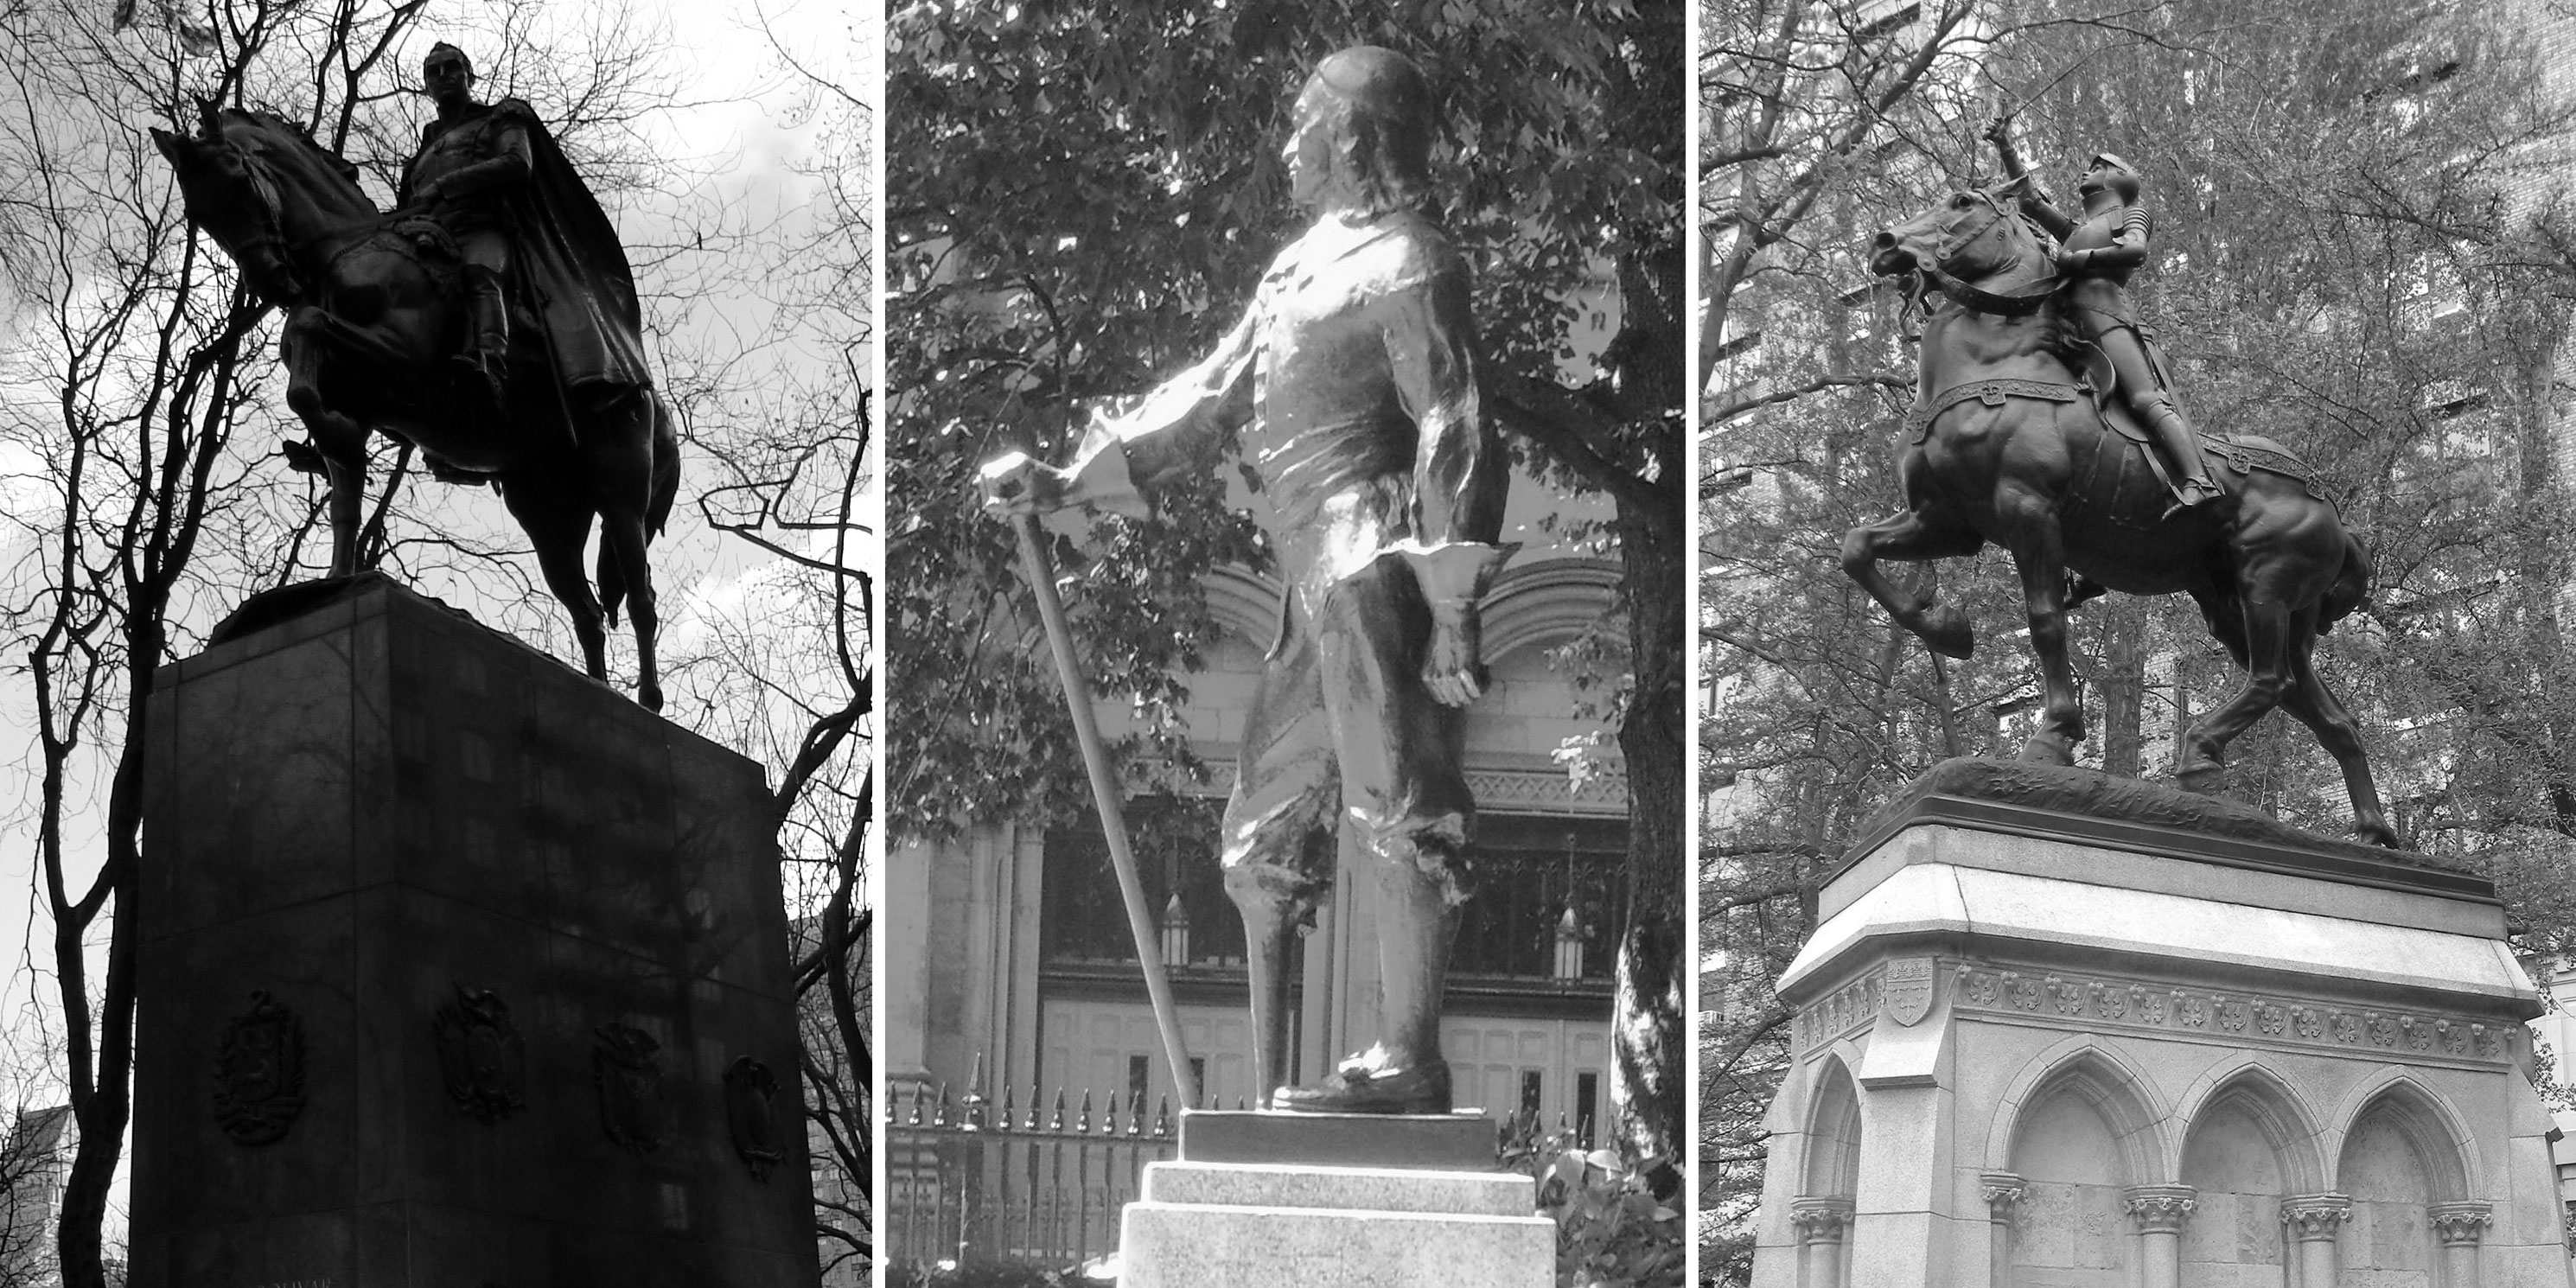 Statues - Simón Bolívar by Sally Jane Farnham, Peter Stuyvesant by Gertrude Vanderbilt Whitney, and Joan of Arc by Anna Hyatt Huntington